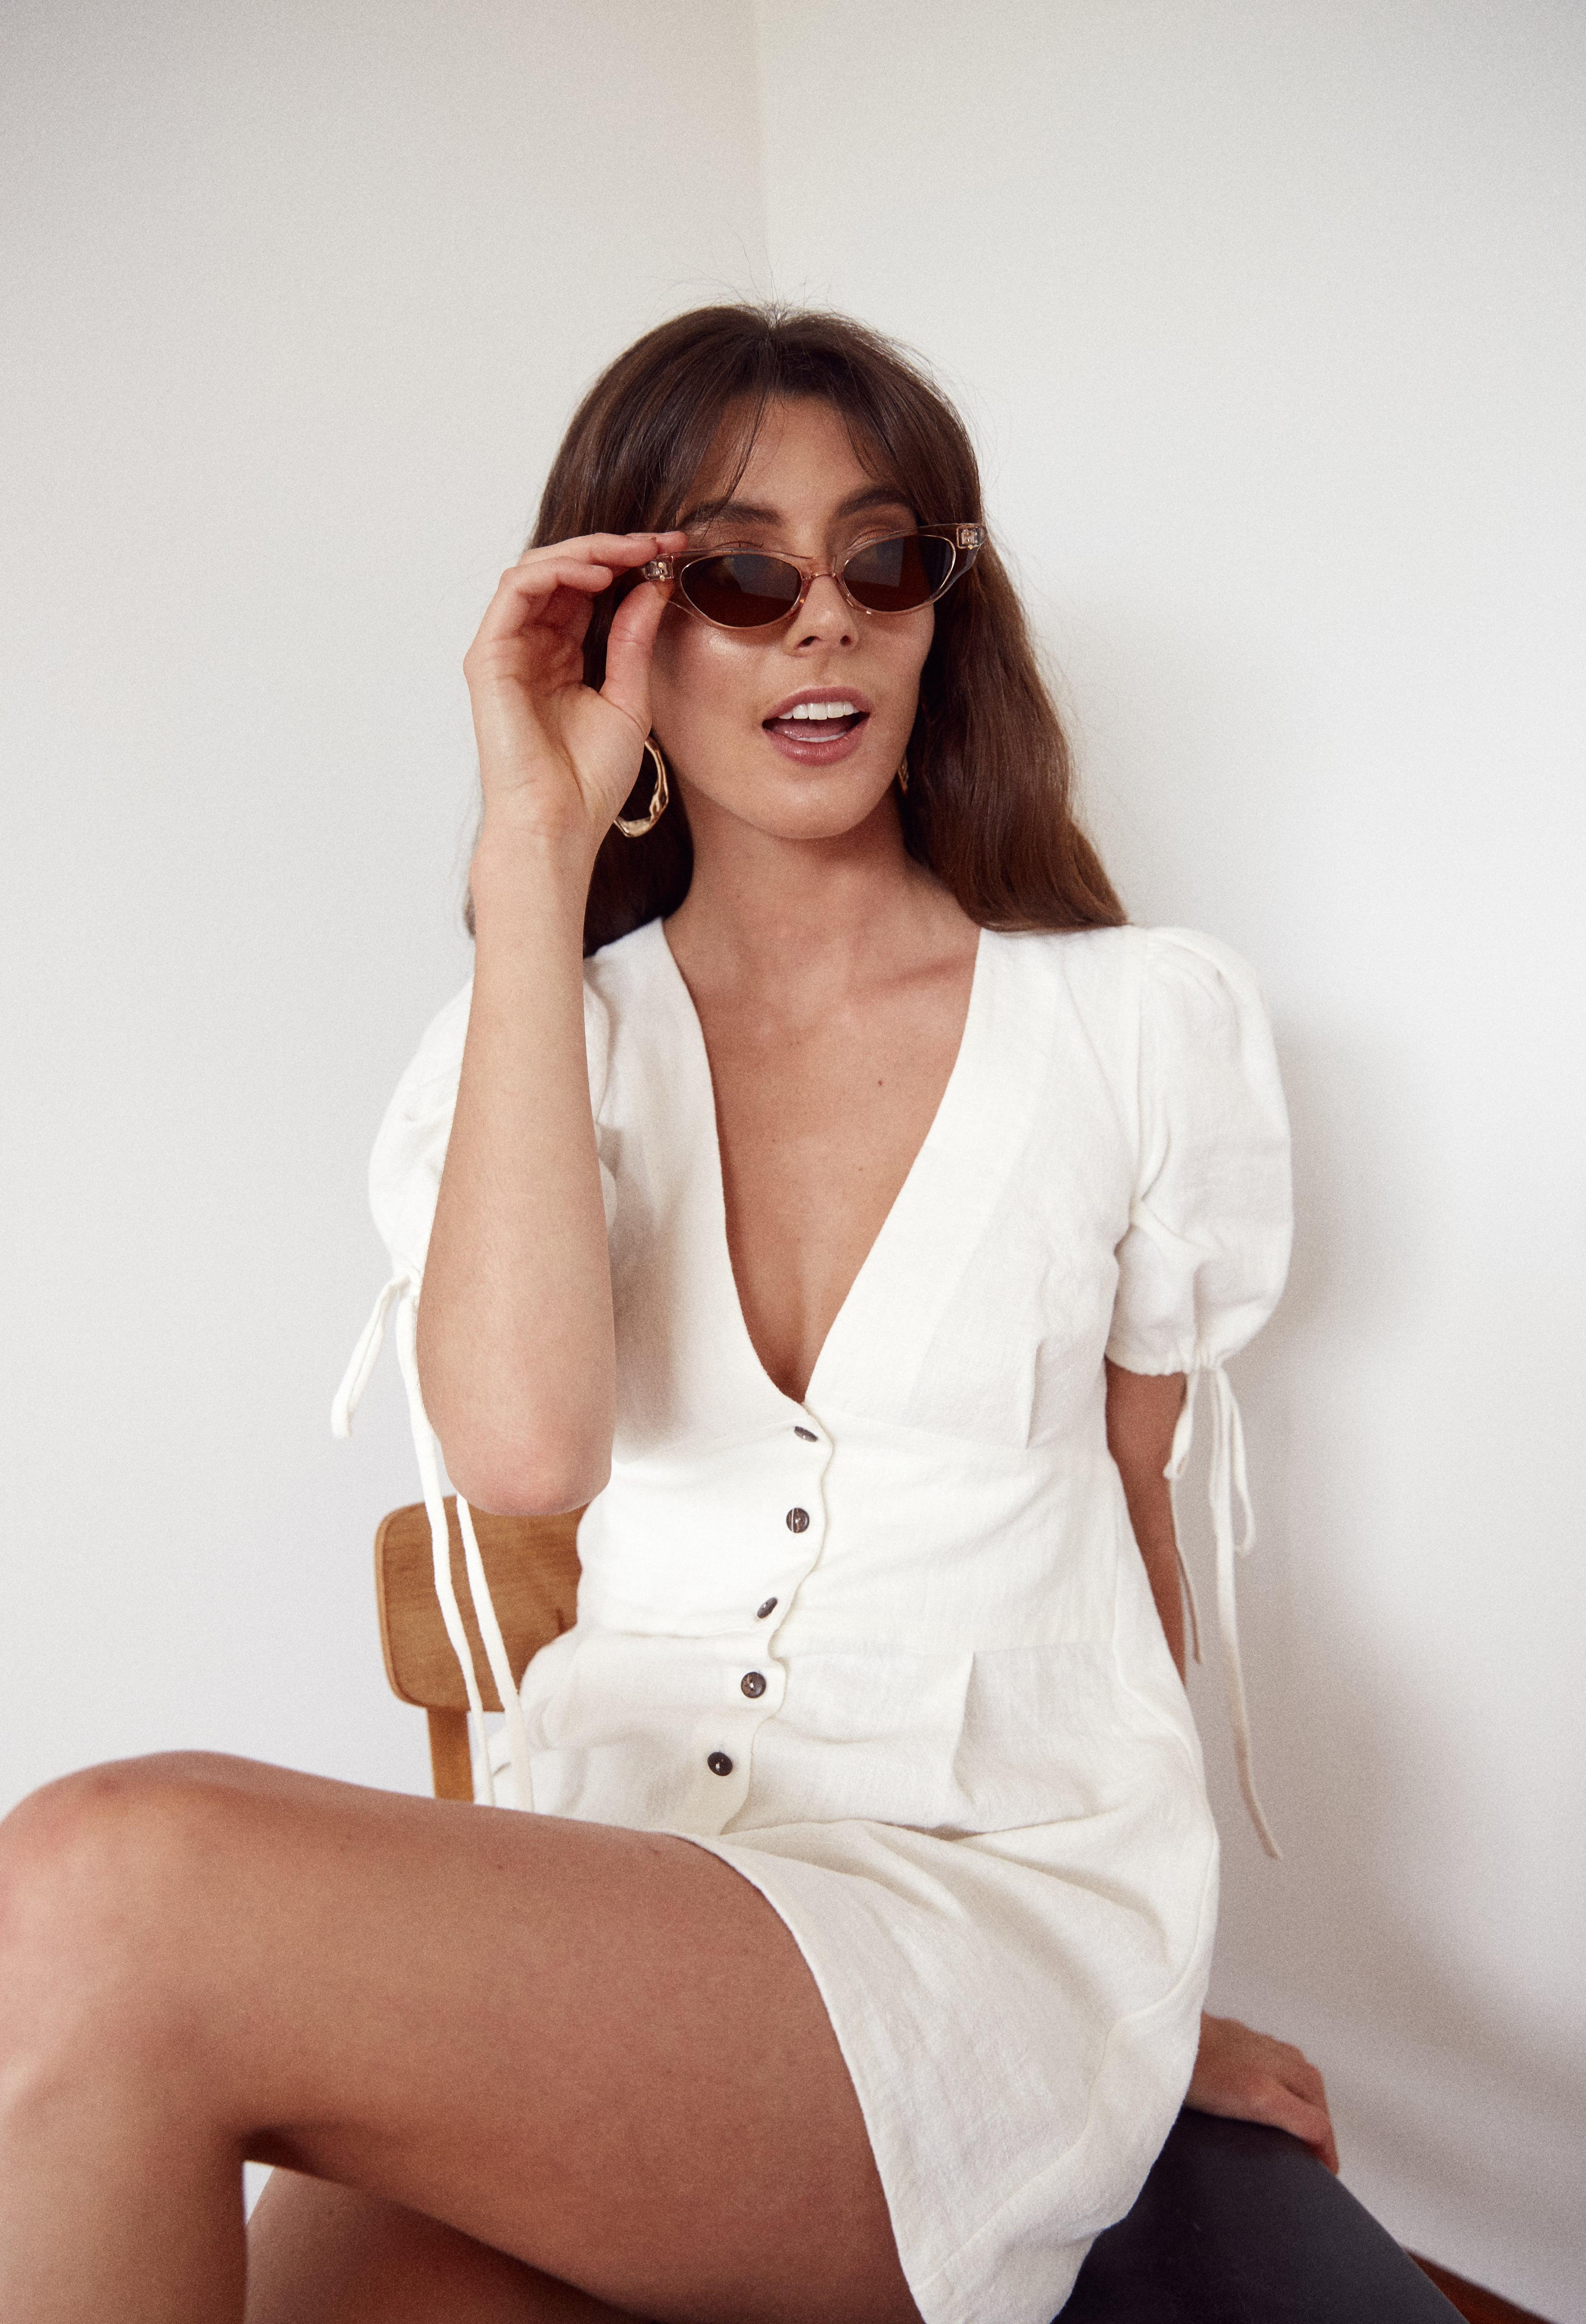 Model wearing cats-eye sunglasses